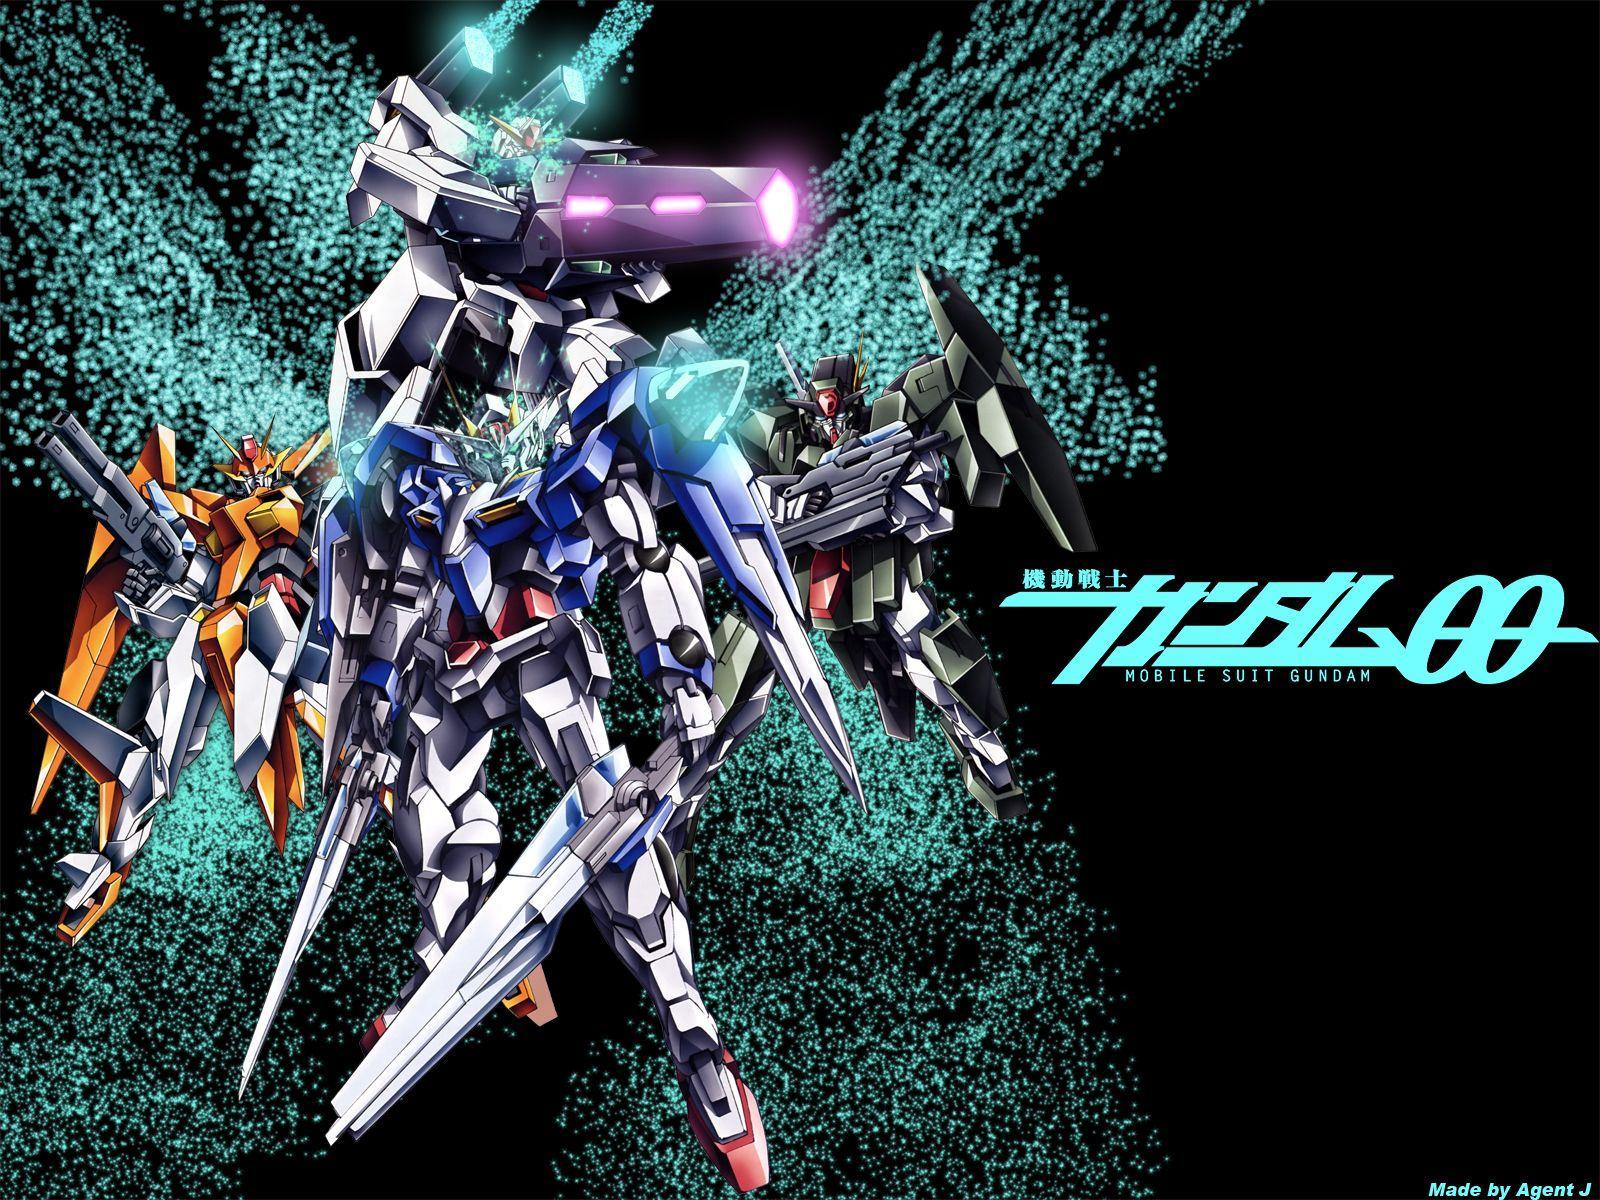 Mobile Suit Gundam 00 Wallpapers Top Free Mobile Suit Gundam 00